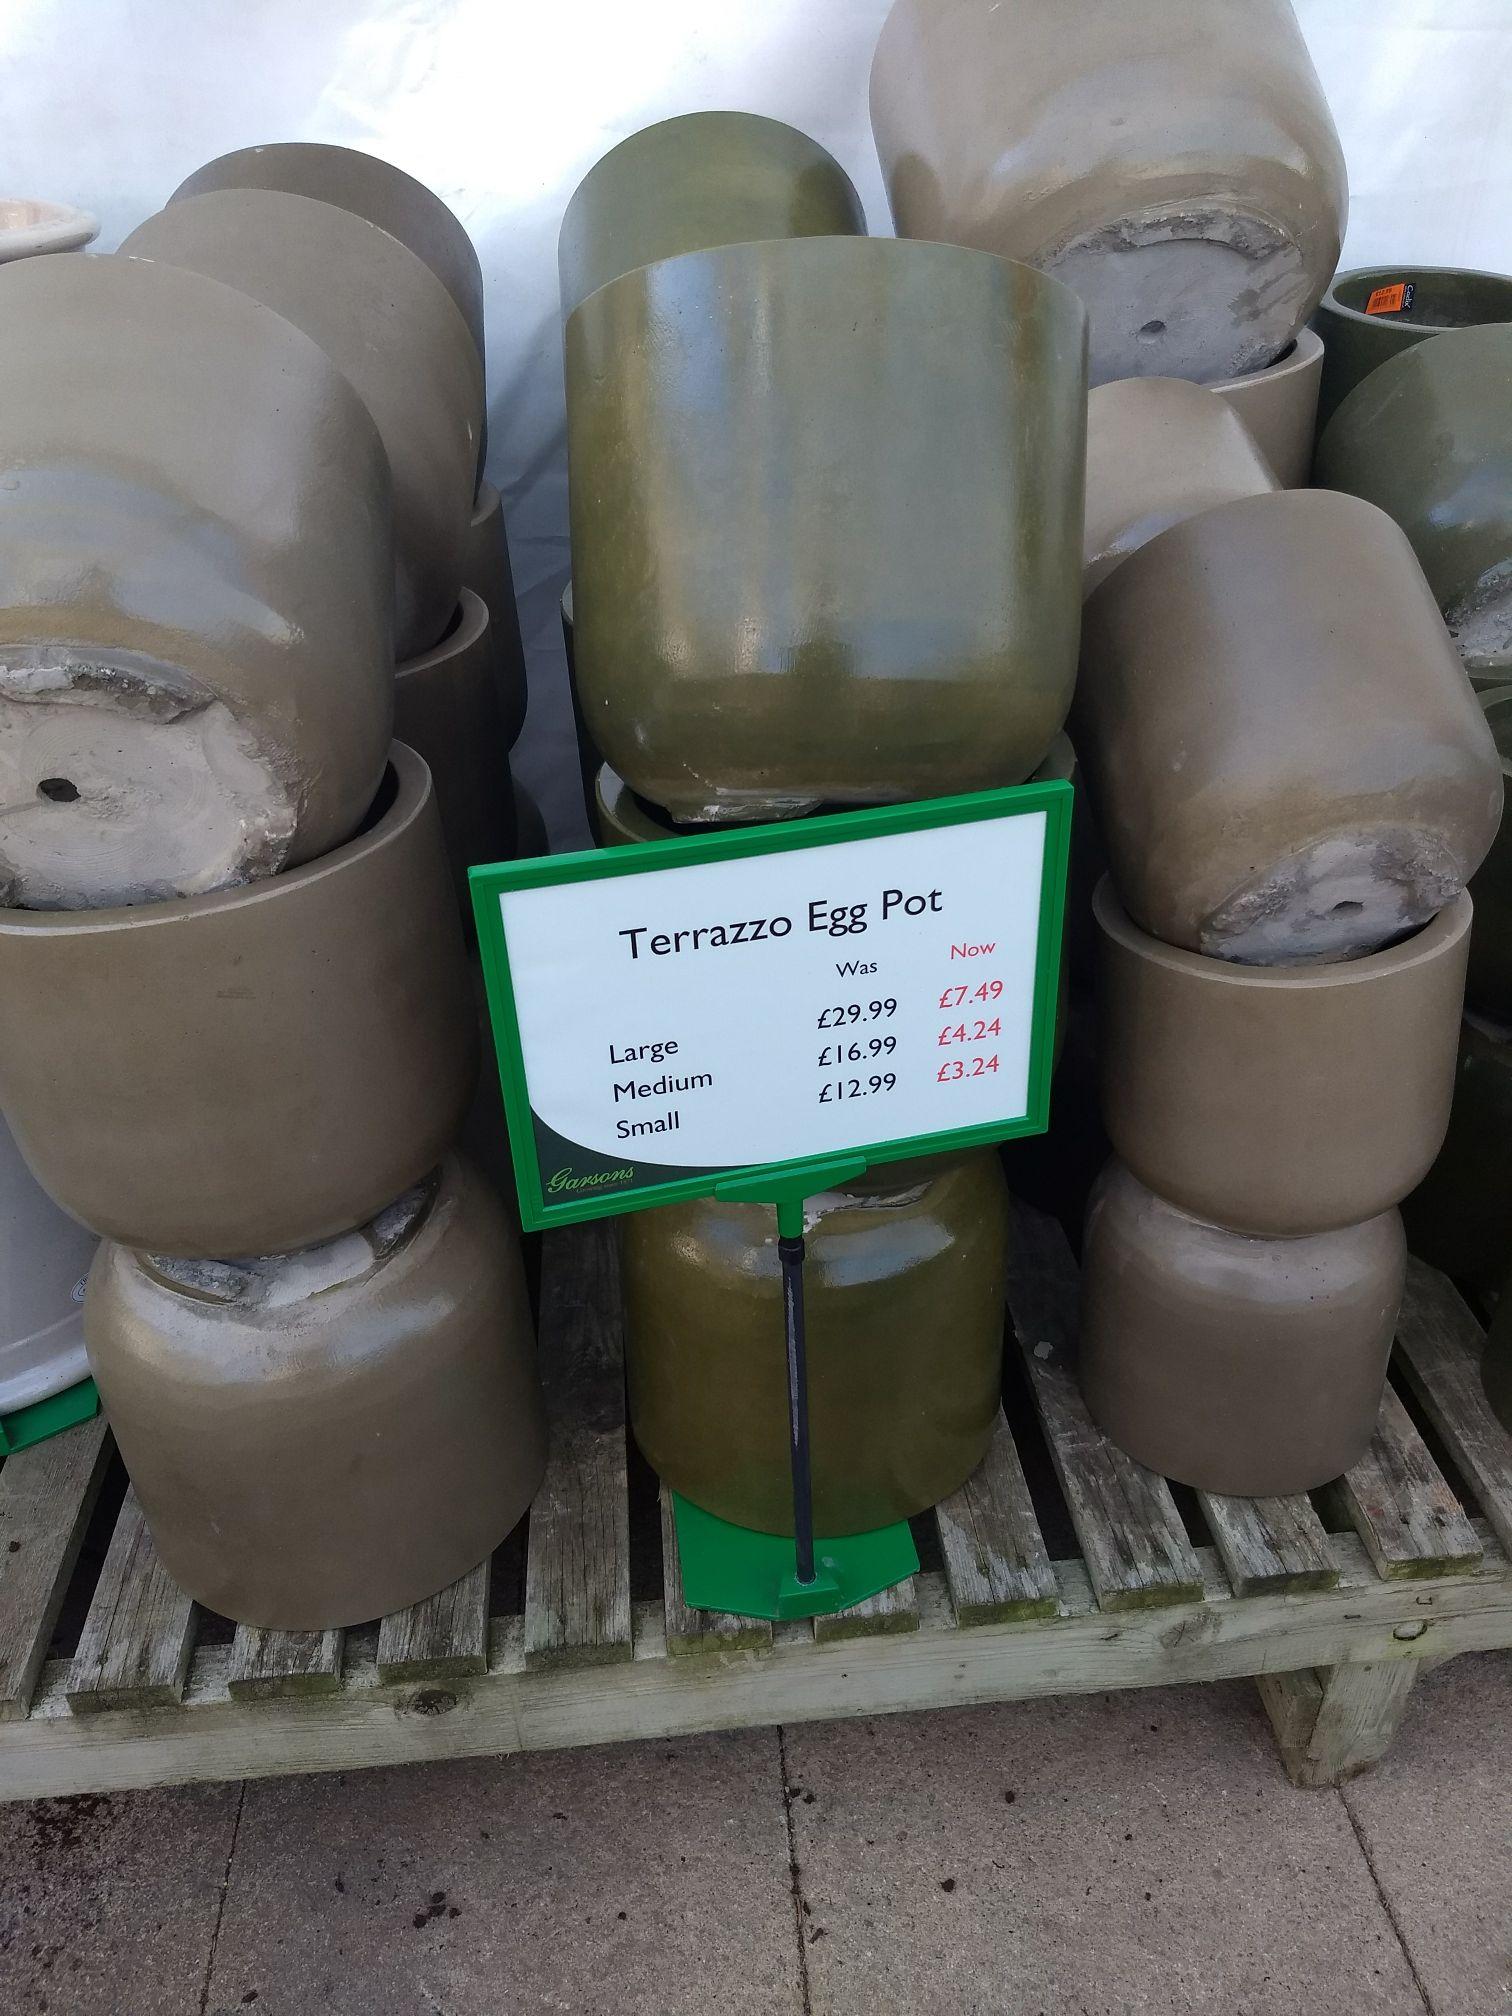 75% off Terrazzo egg pots small £3.24  medium £4.24 large £7.49 @ Garsons - Tichfield near Fareham Hampshire